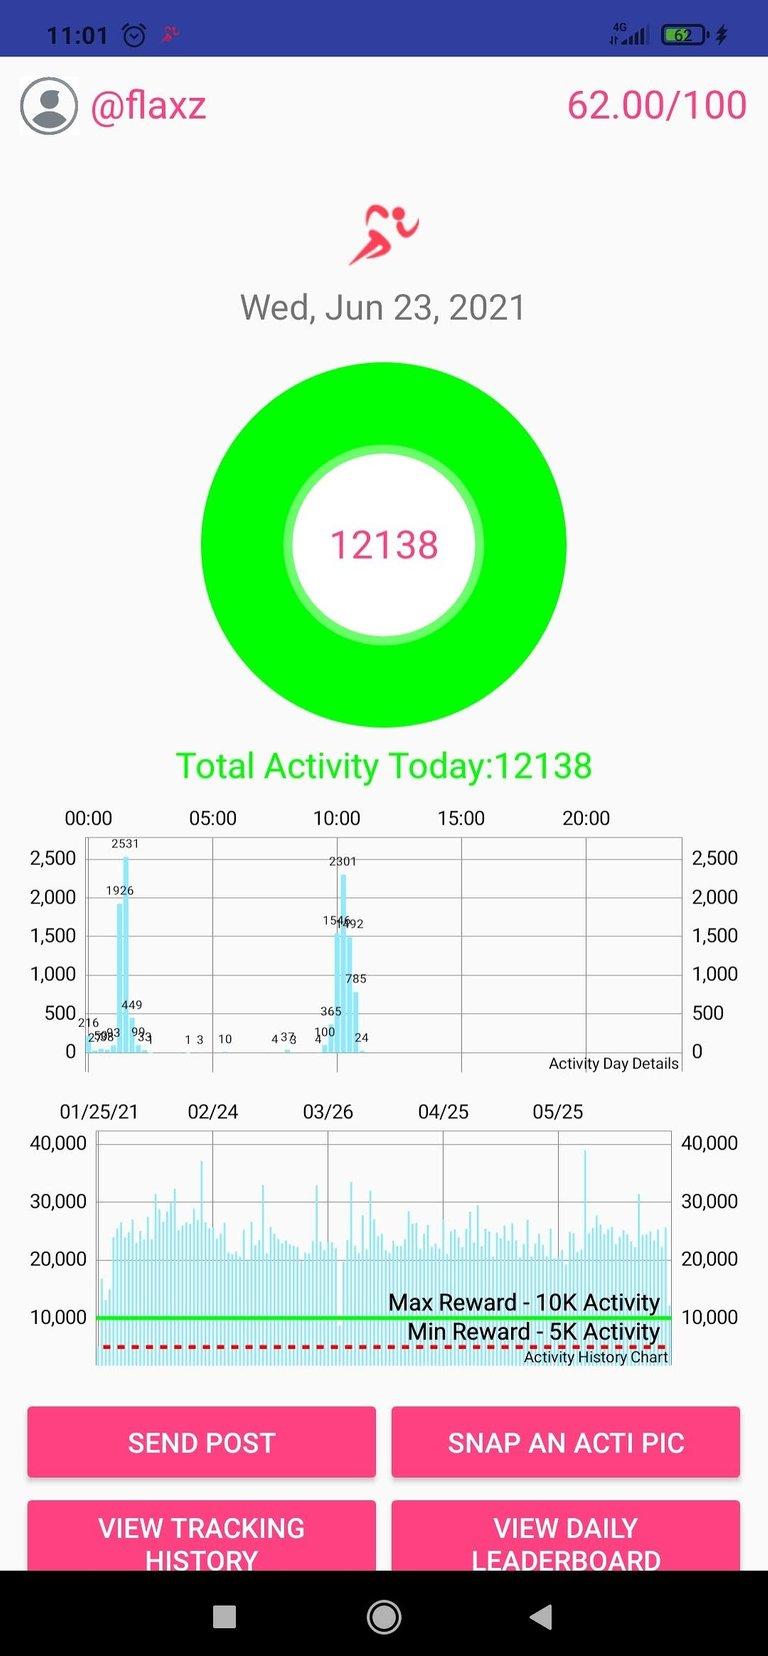 Screenshot_2021-06-23-11-01-54-522_io.actifit.fitnesstracker.actifitfitnesstracker.jpg